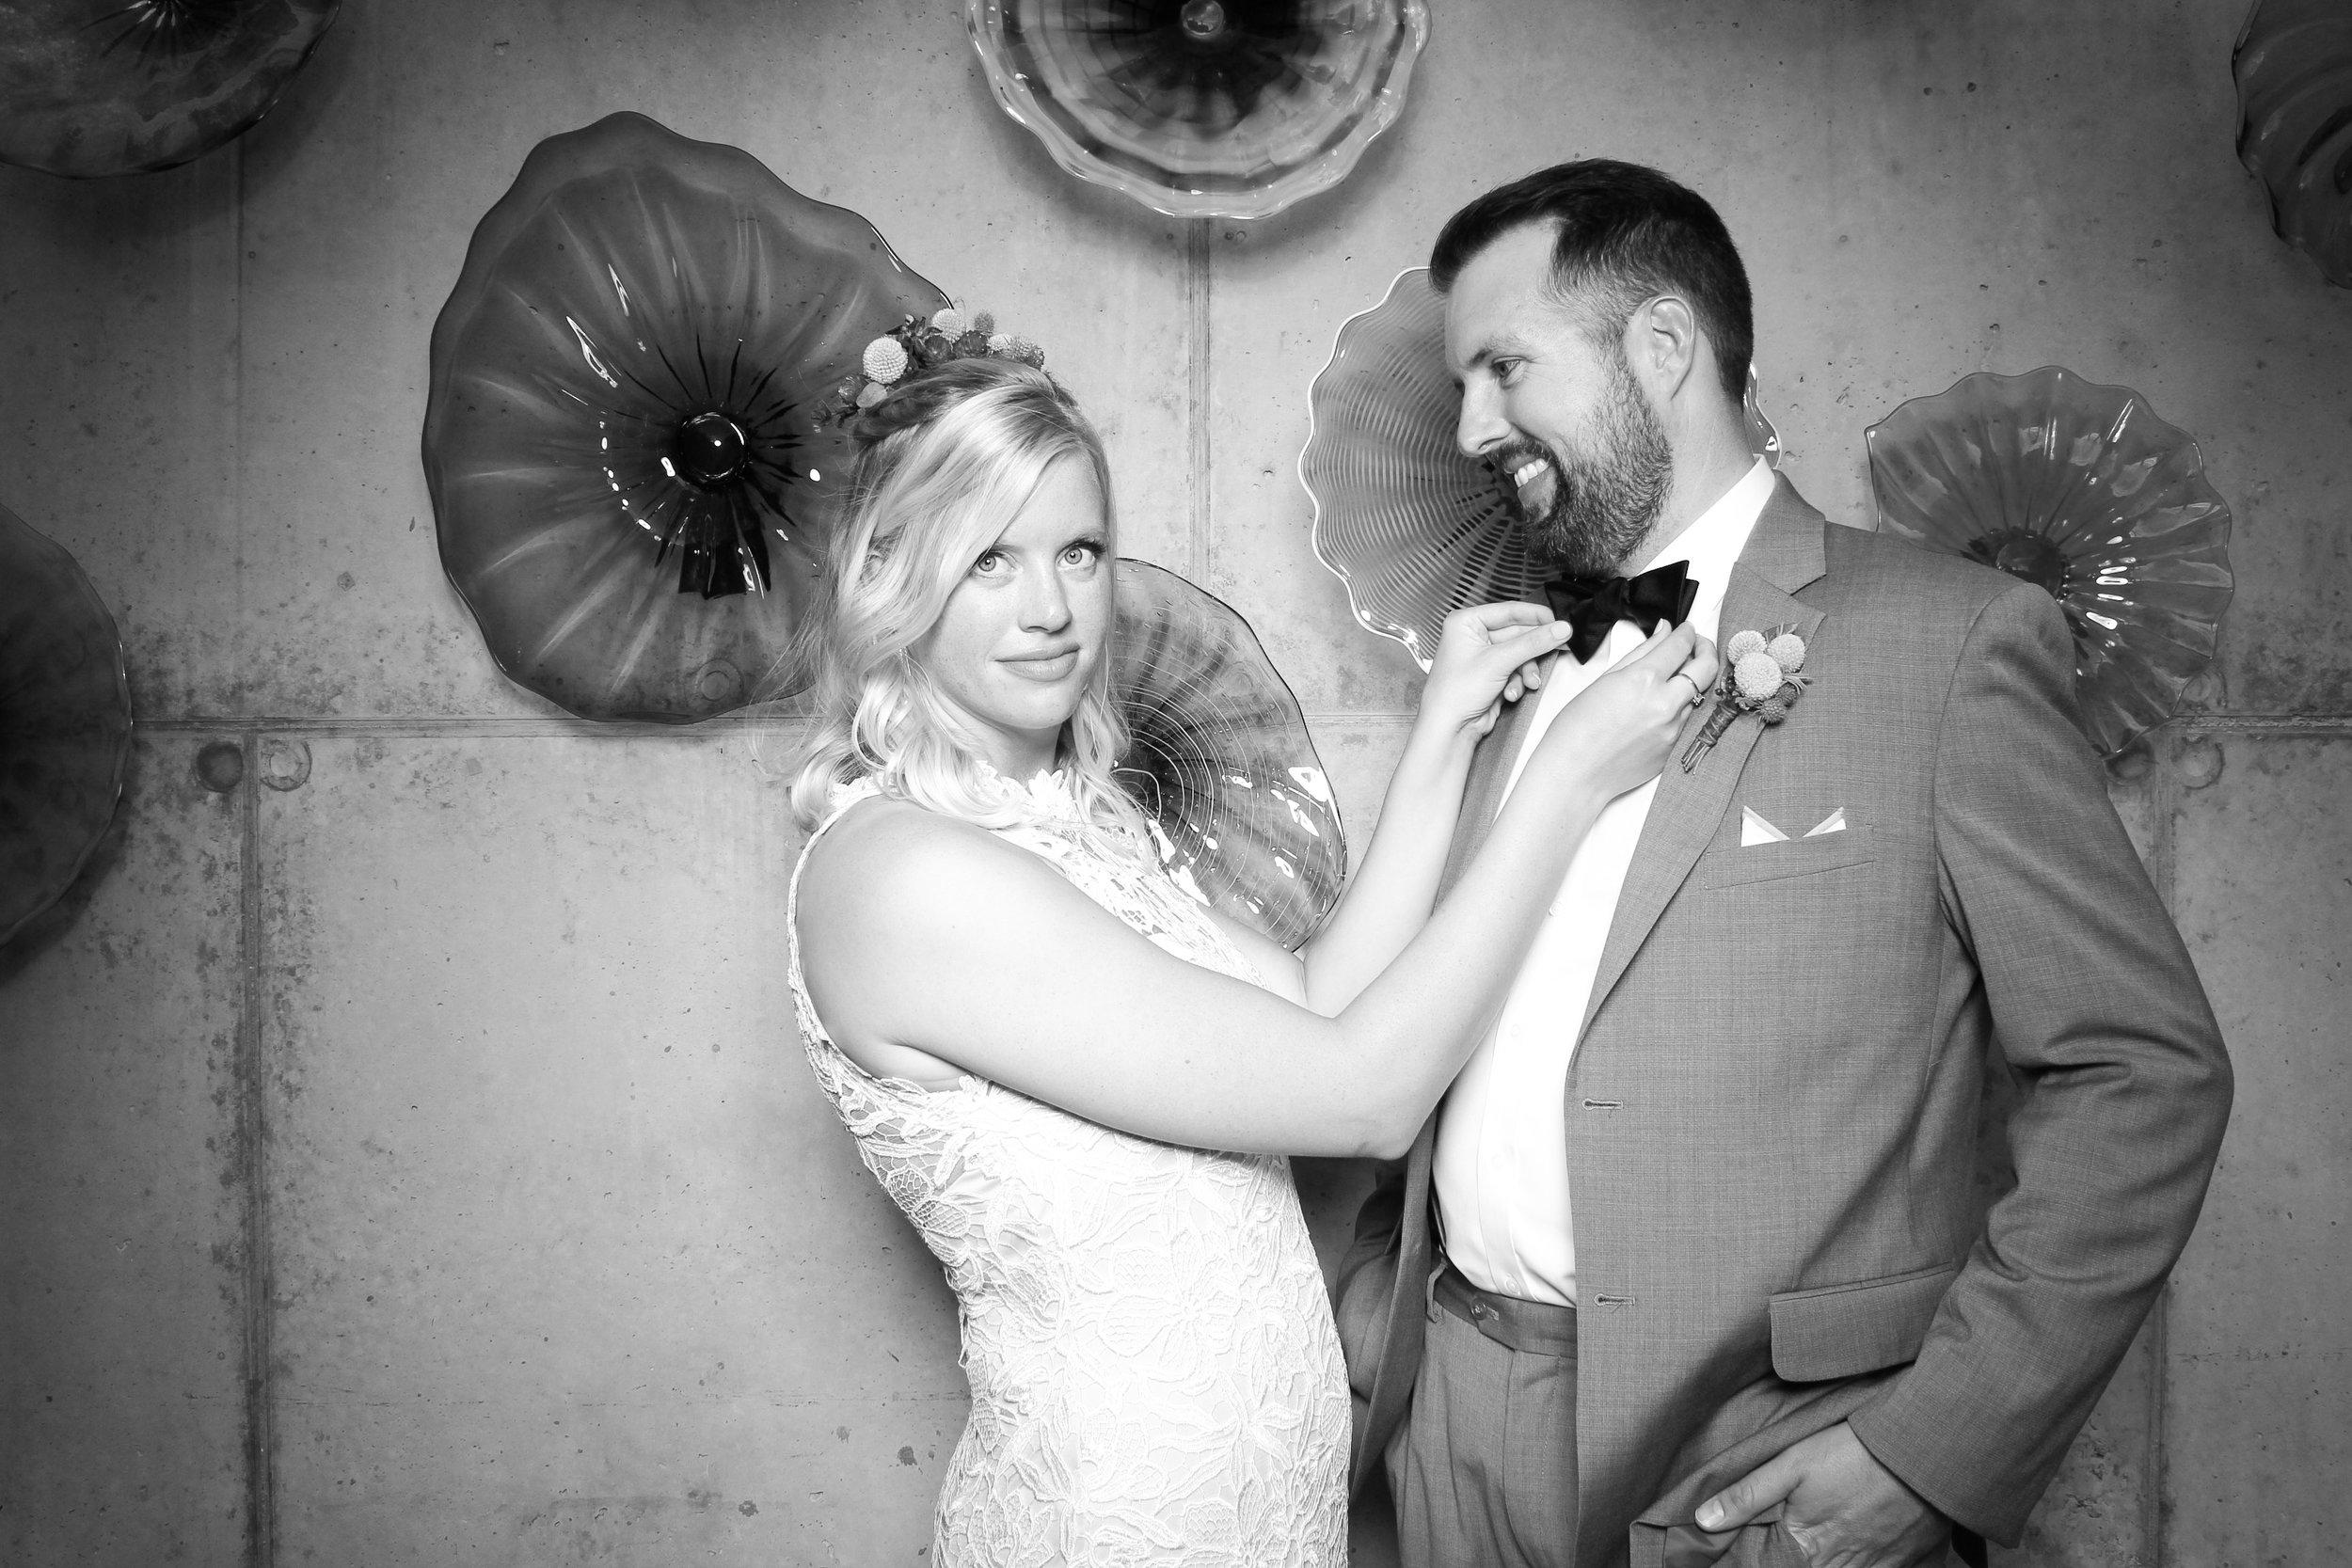 Chicago_Vintage_Wedding_Photobooth_Ignite_03.jpg